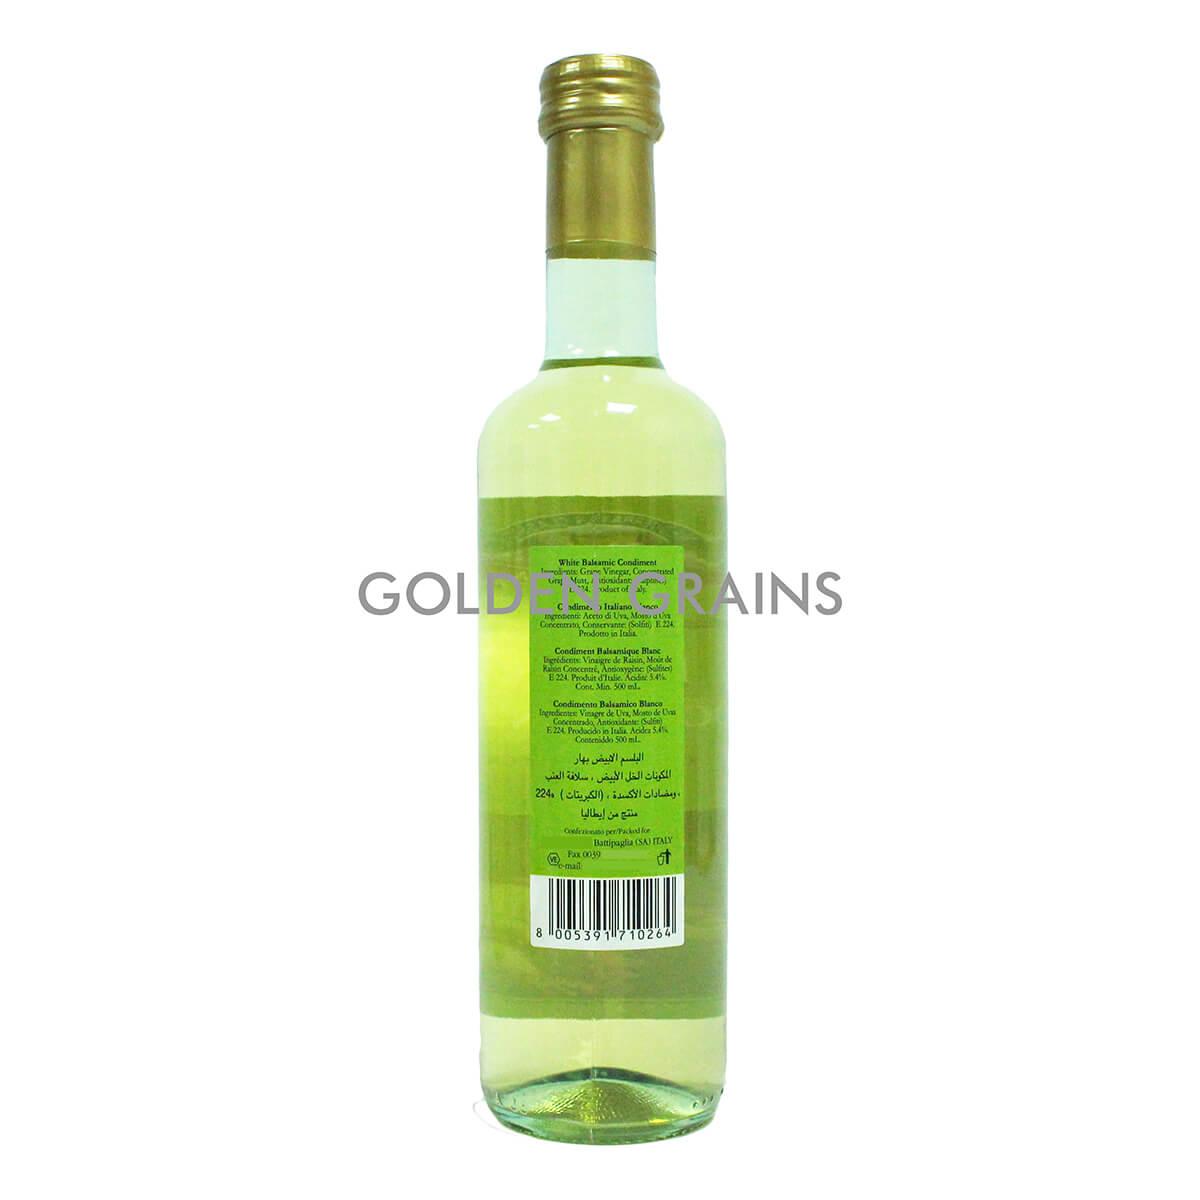 Golden Grains Campagna - Balsamic Vinegar - 500ML - Italy - Back.jpg